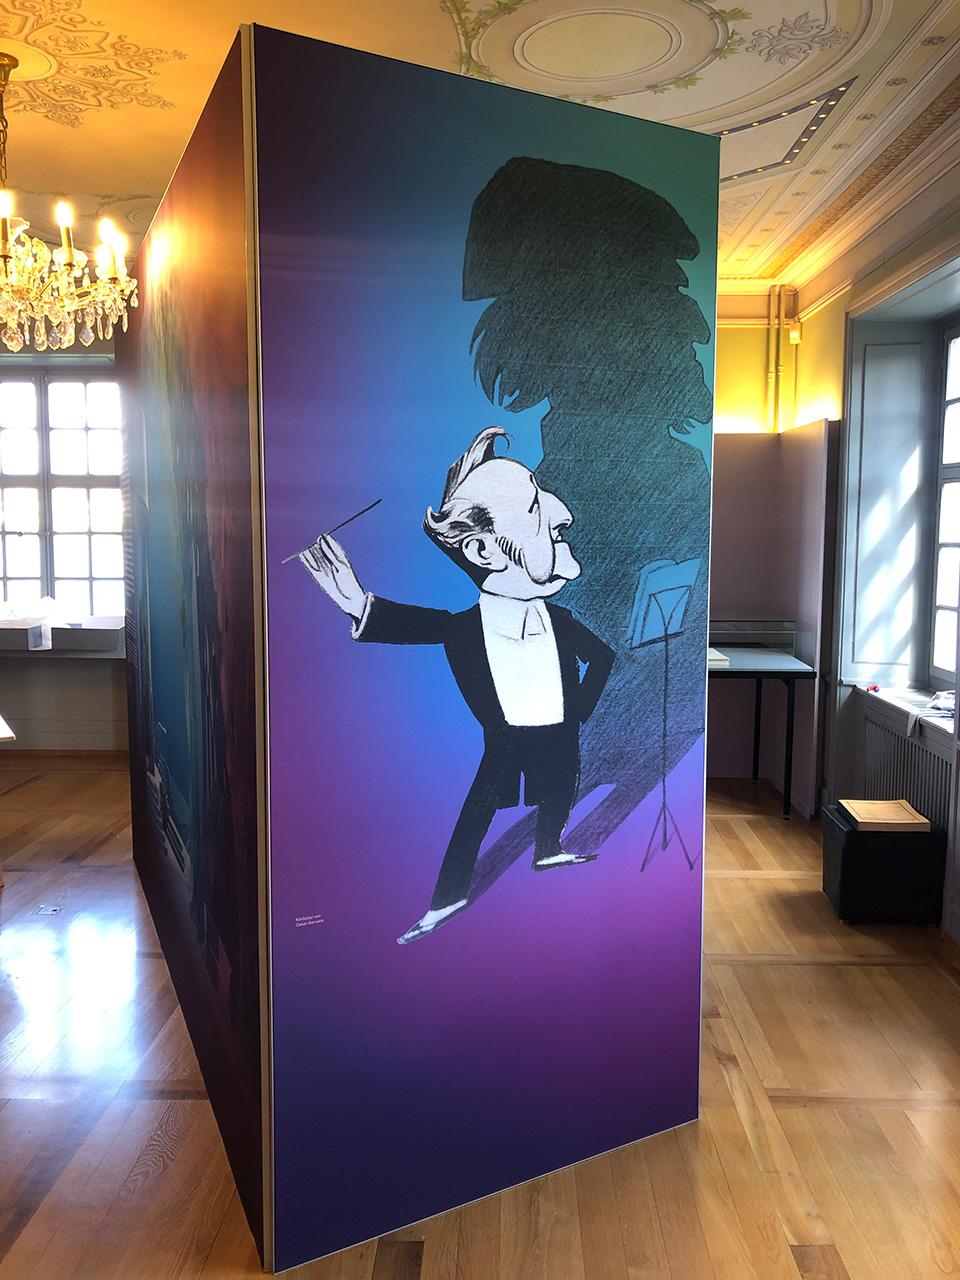 Museen-Ausstellungen - Ausstellung Sigfried Wagner, Richard Wagner Museum Luzern